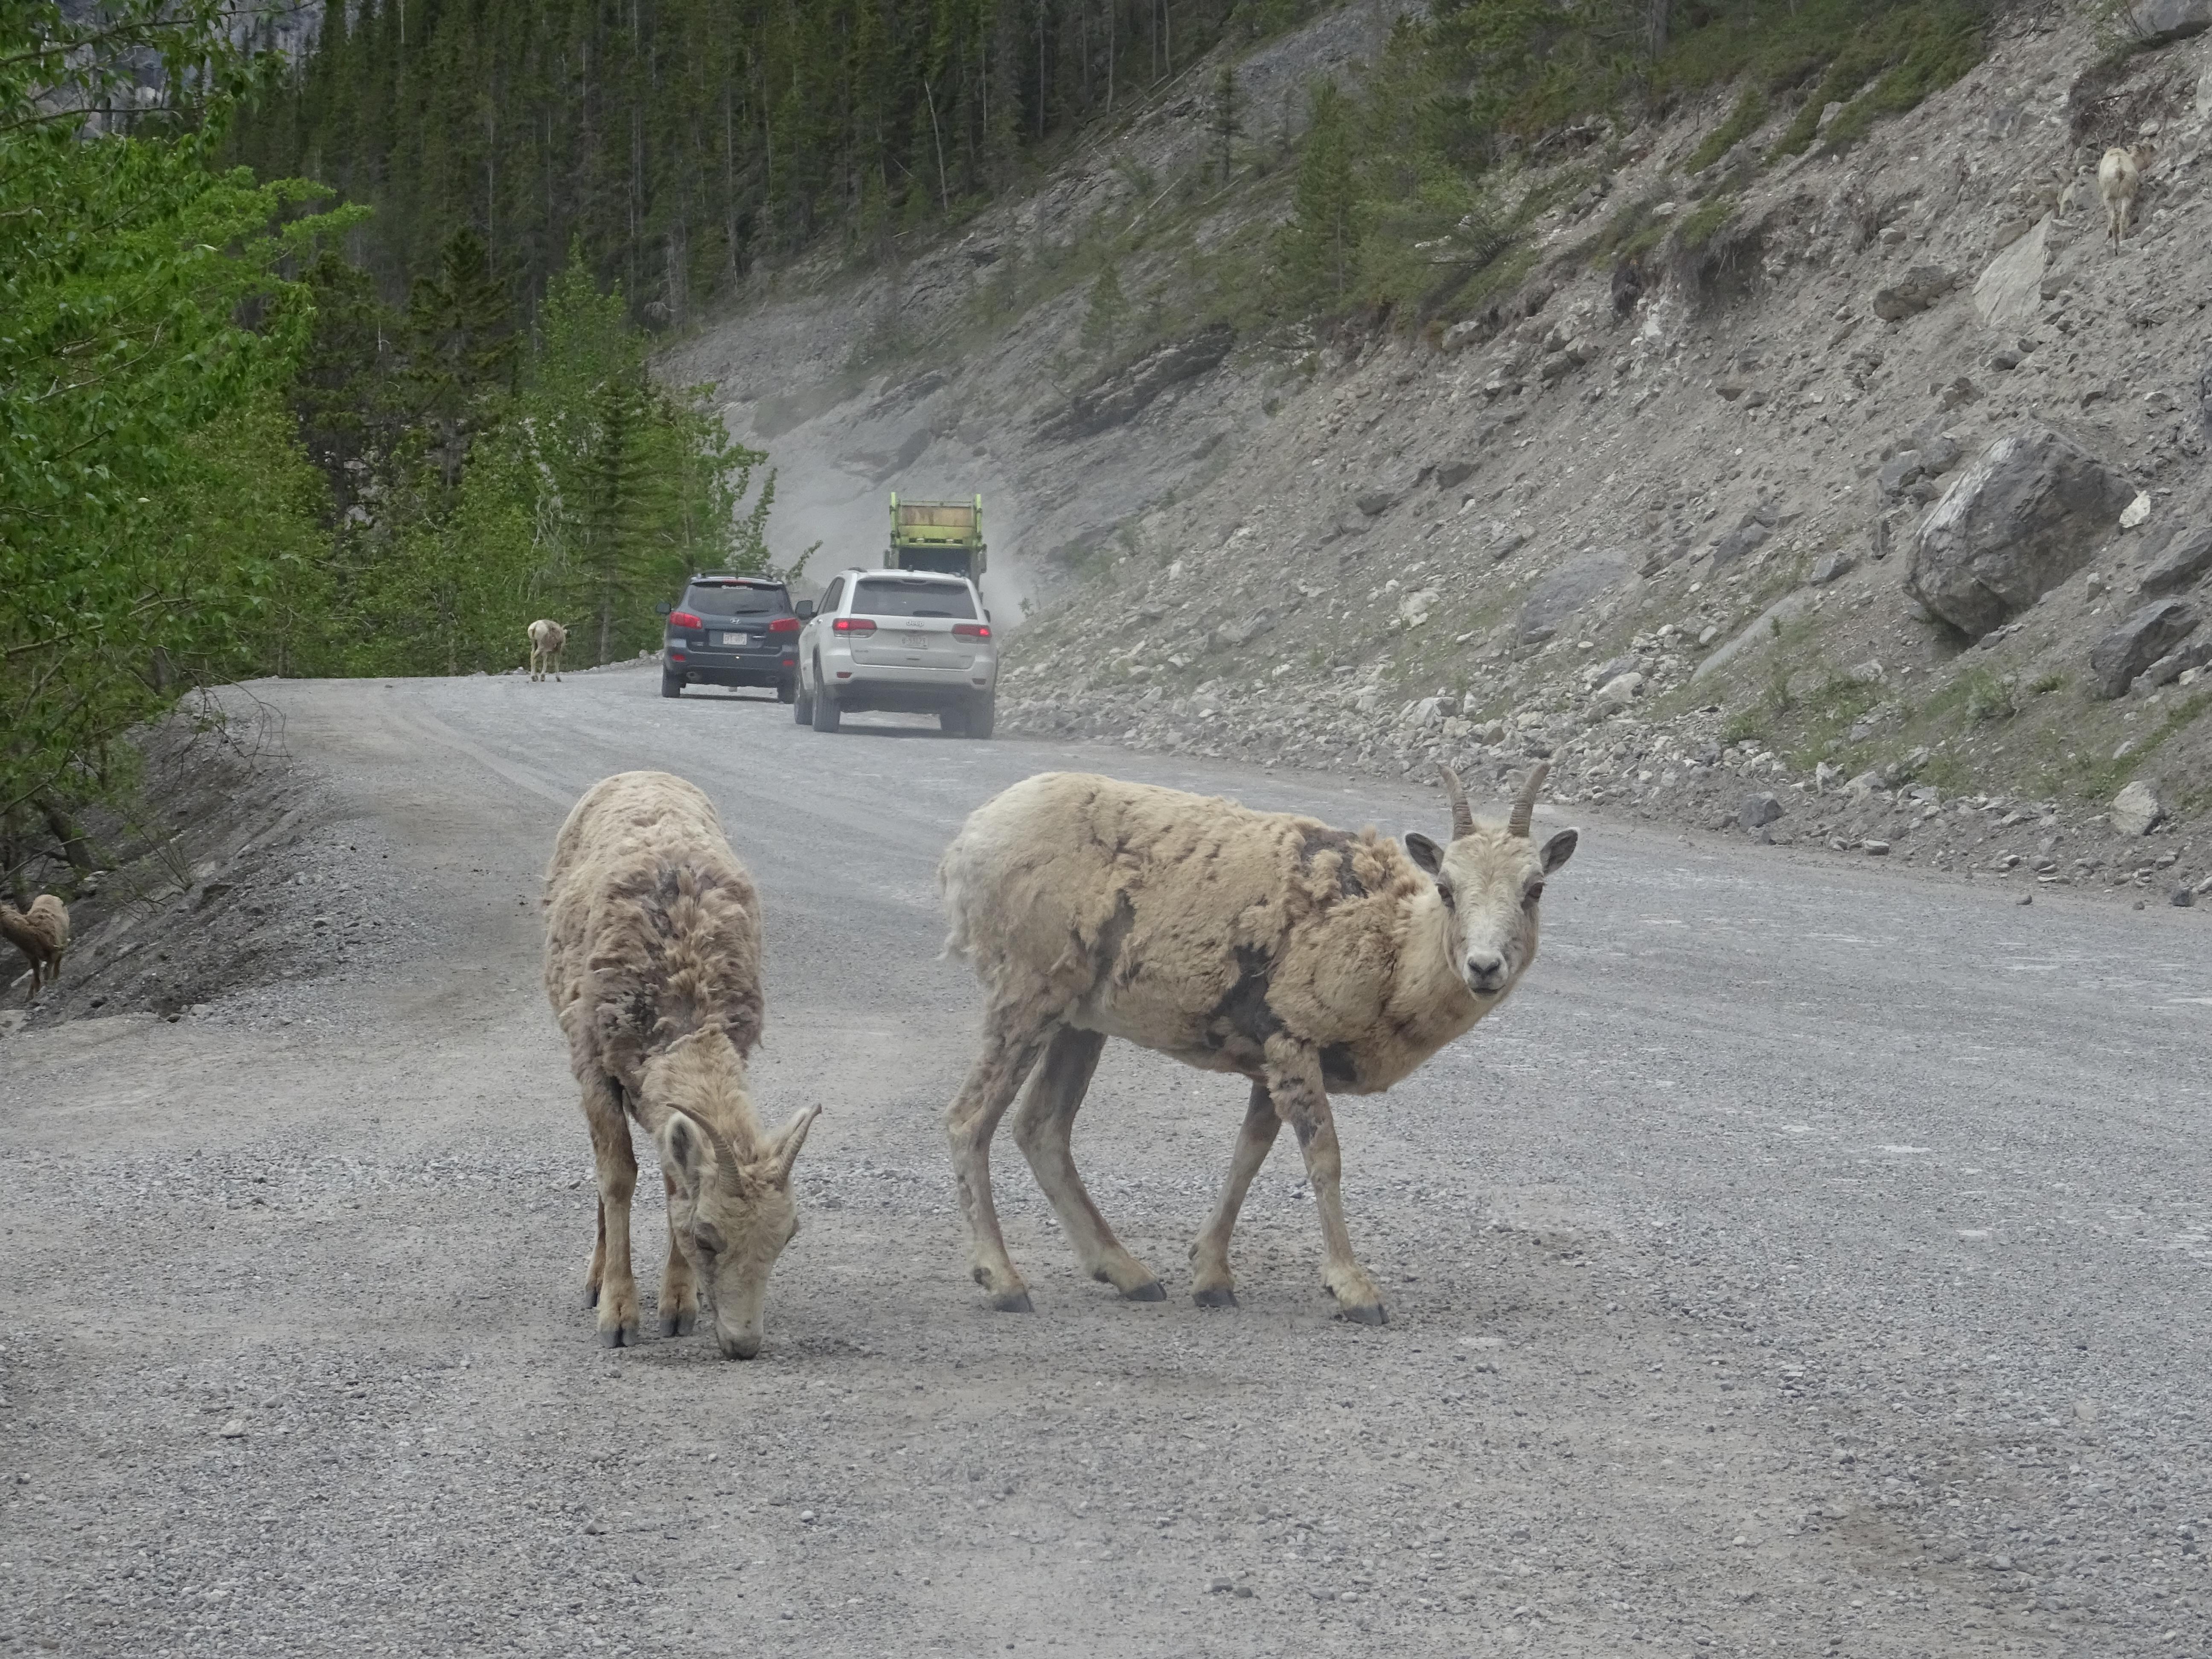 Chèvres de montagne à Canmore, Alberta, Canada